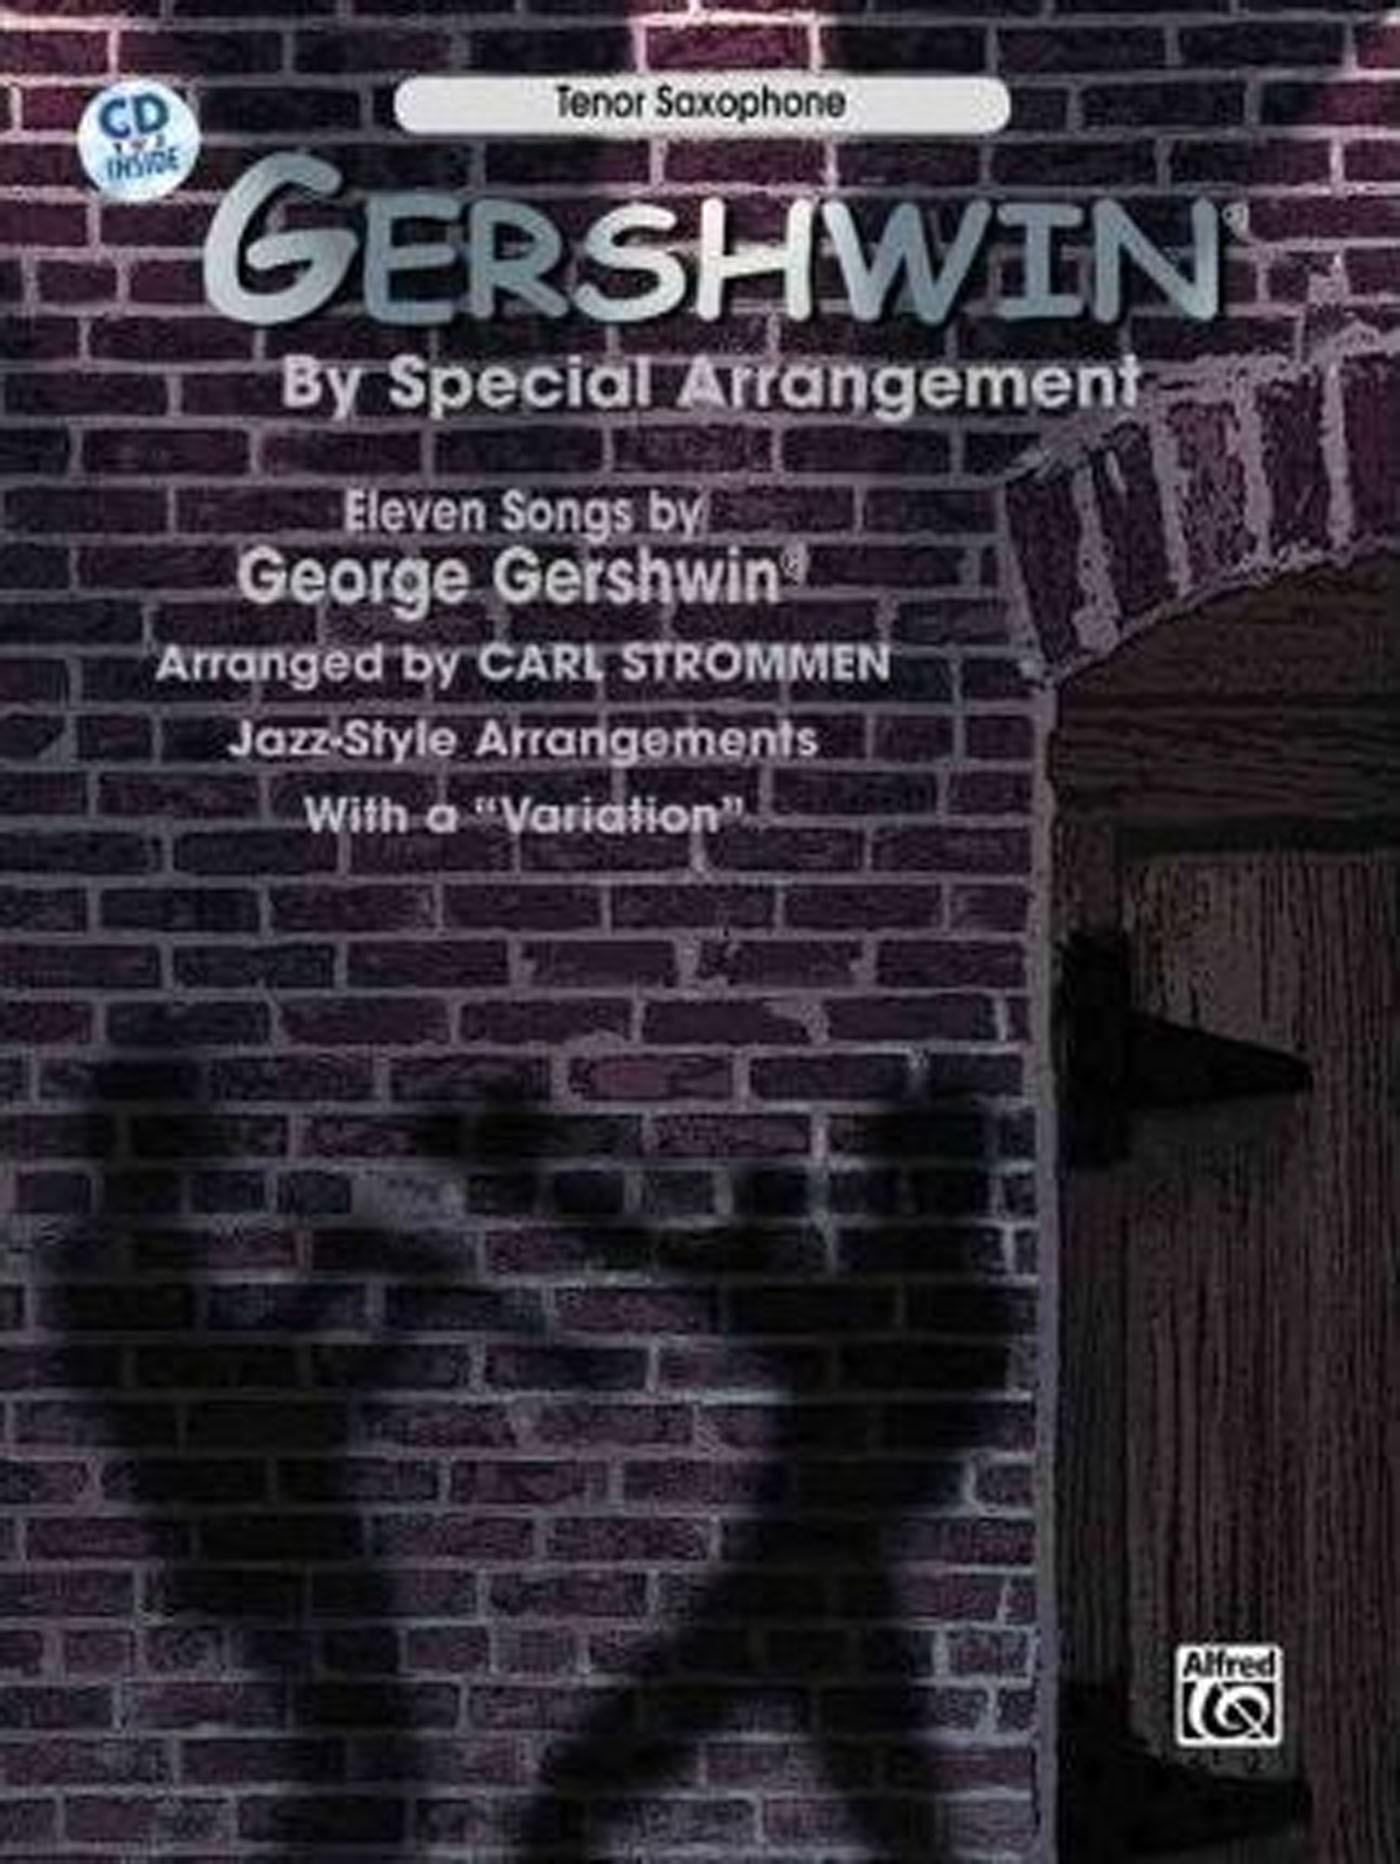 Gershwin by Special Arrangement Jazz Style & Var Tenor Saxophone Book & CD S166